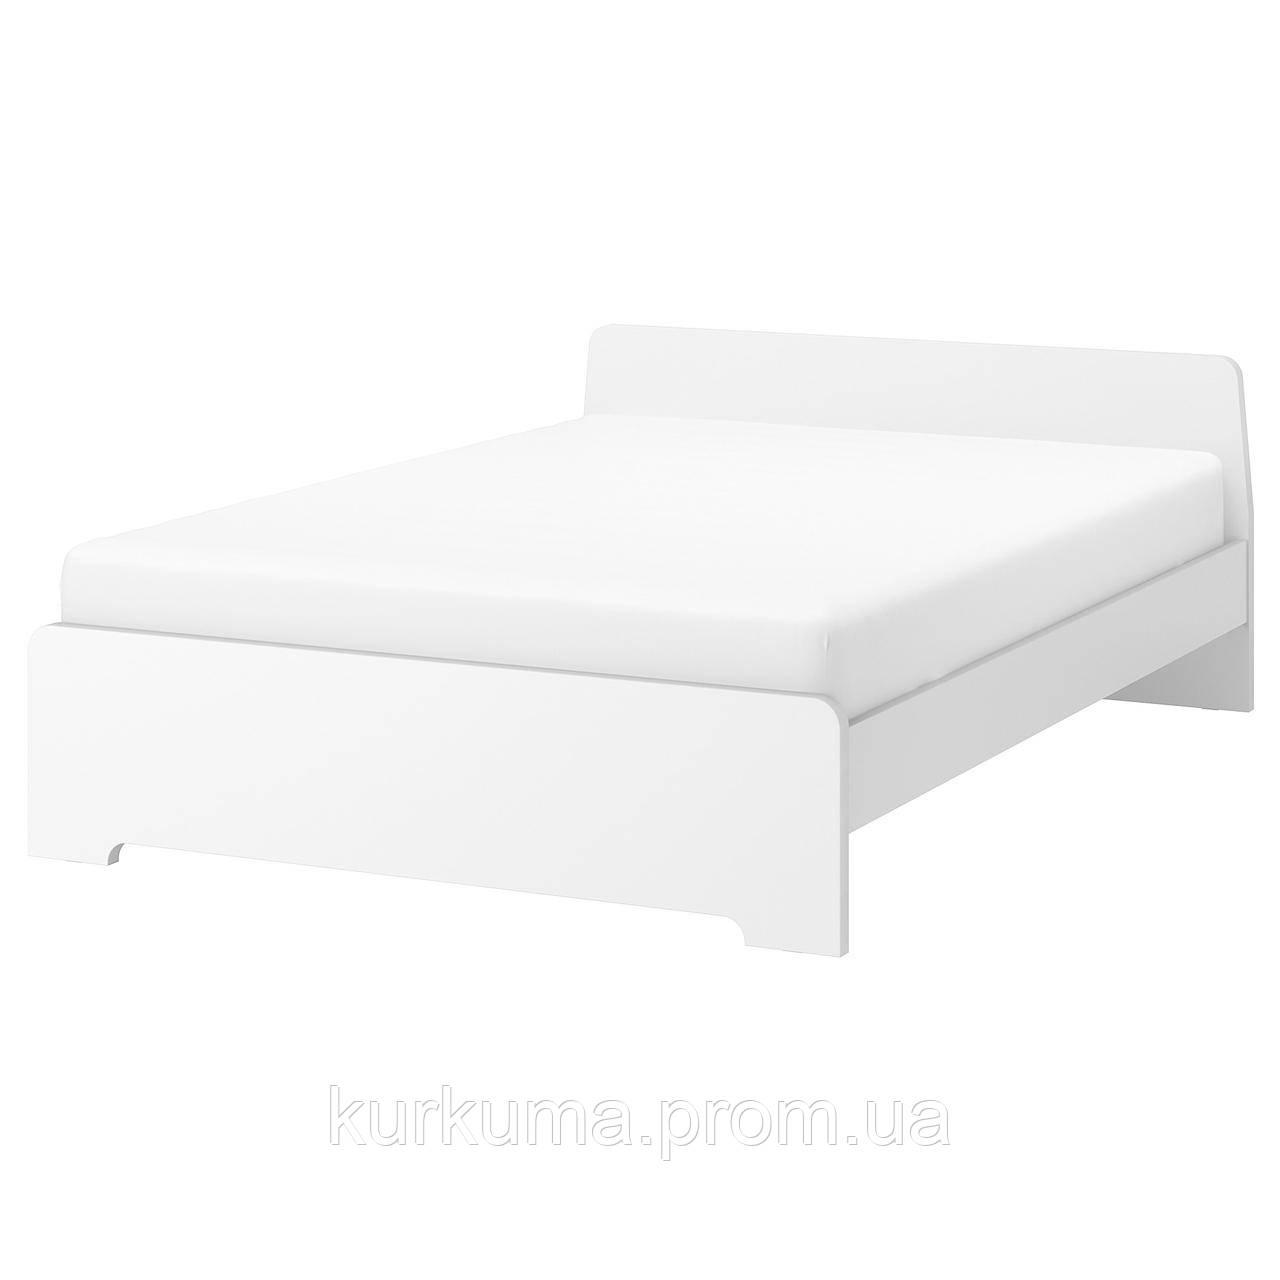 IKEA ASKVOLL Кровать, белый, Леирсунд  (790.305.08)